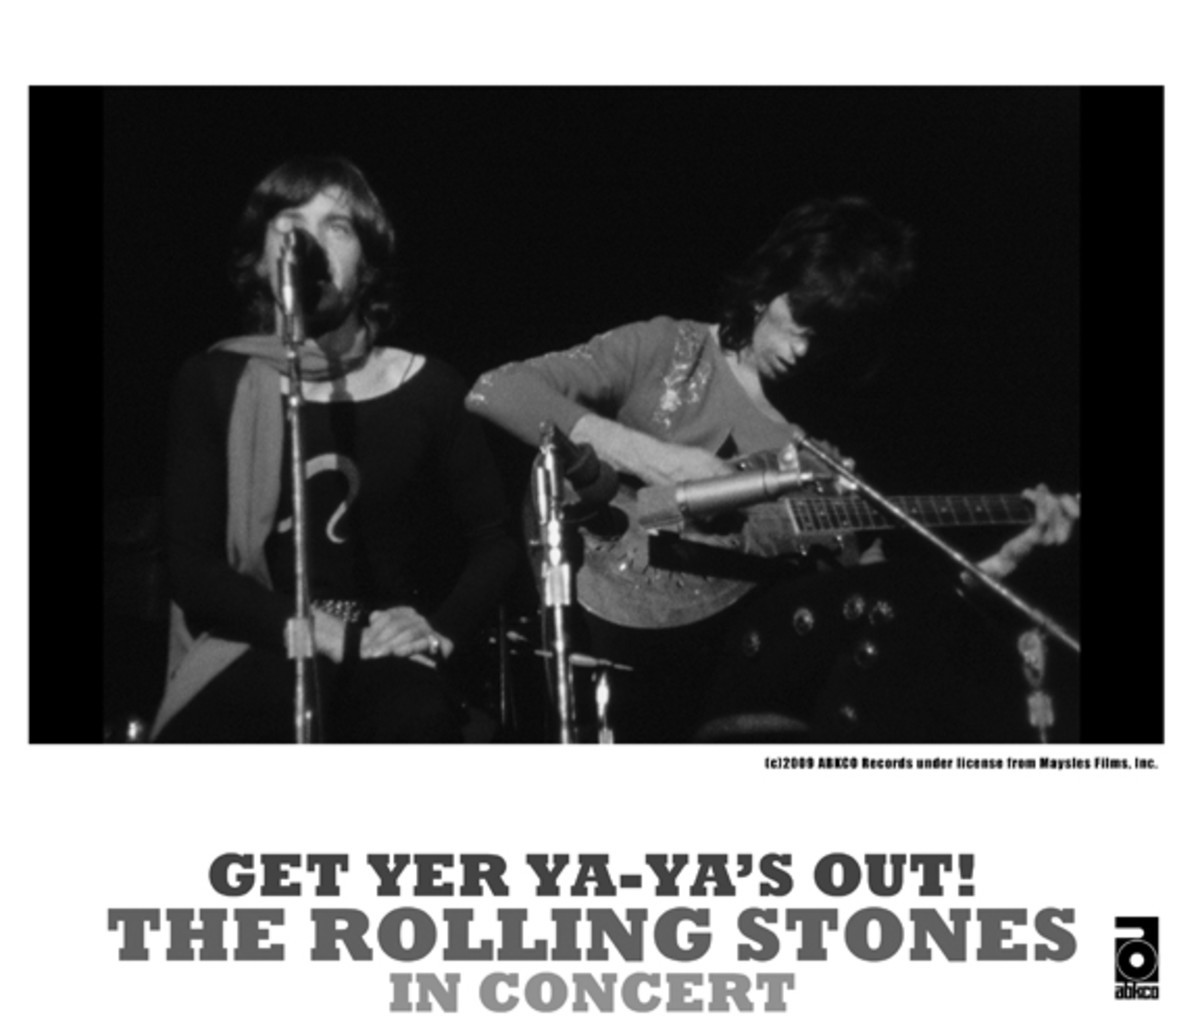 Mick Jagger and Keith Richards in an ABKCO press photo for Ya-Ya's